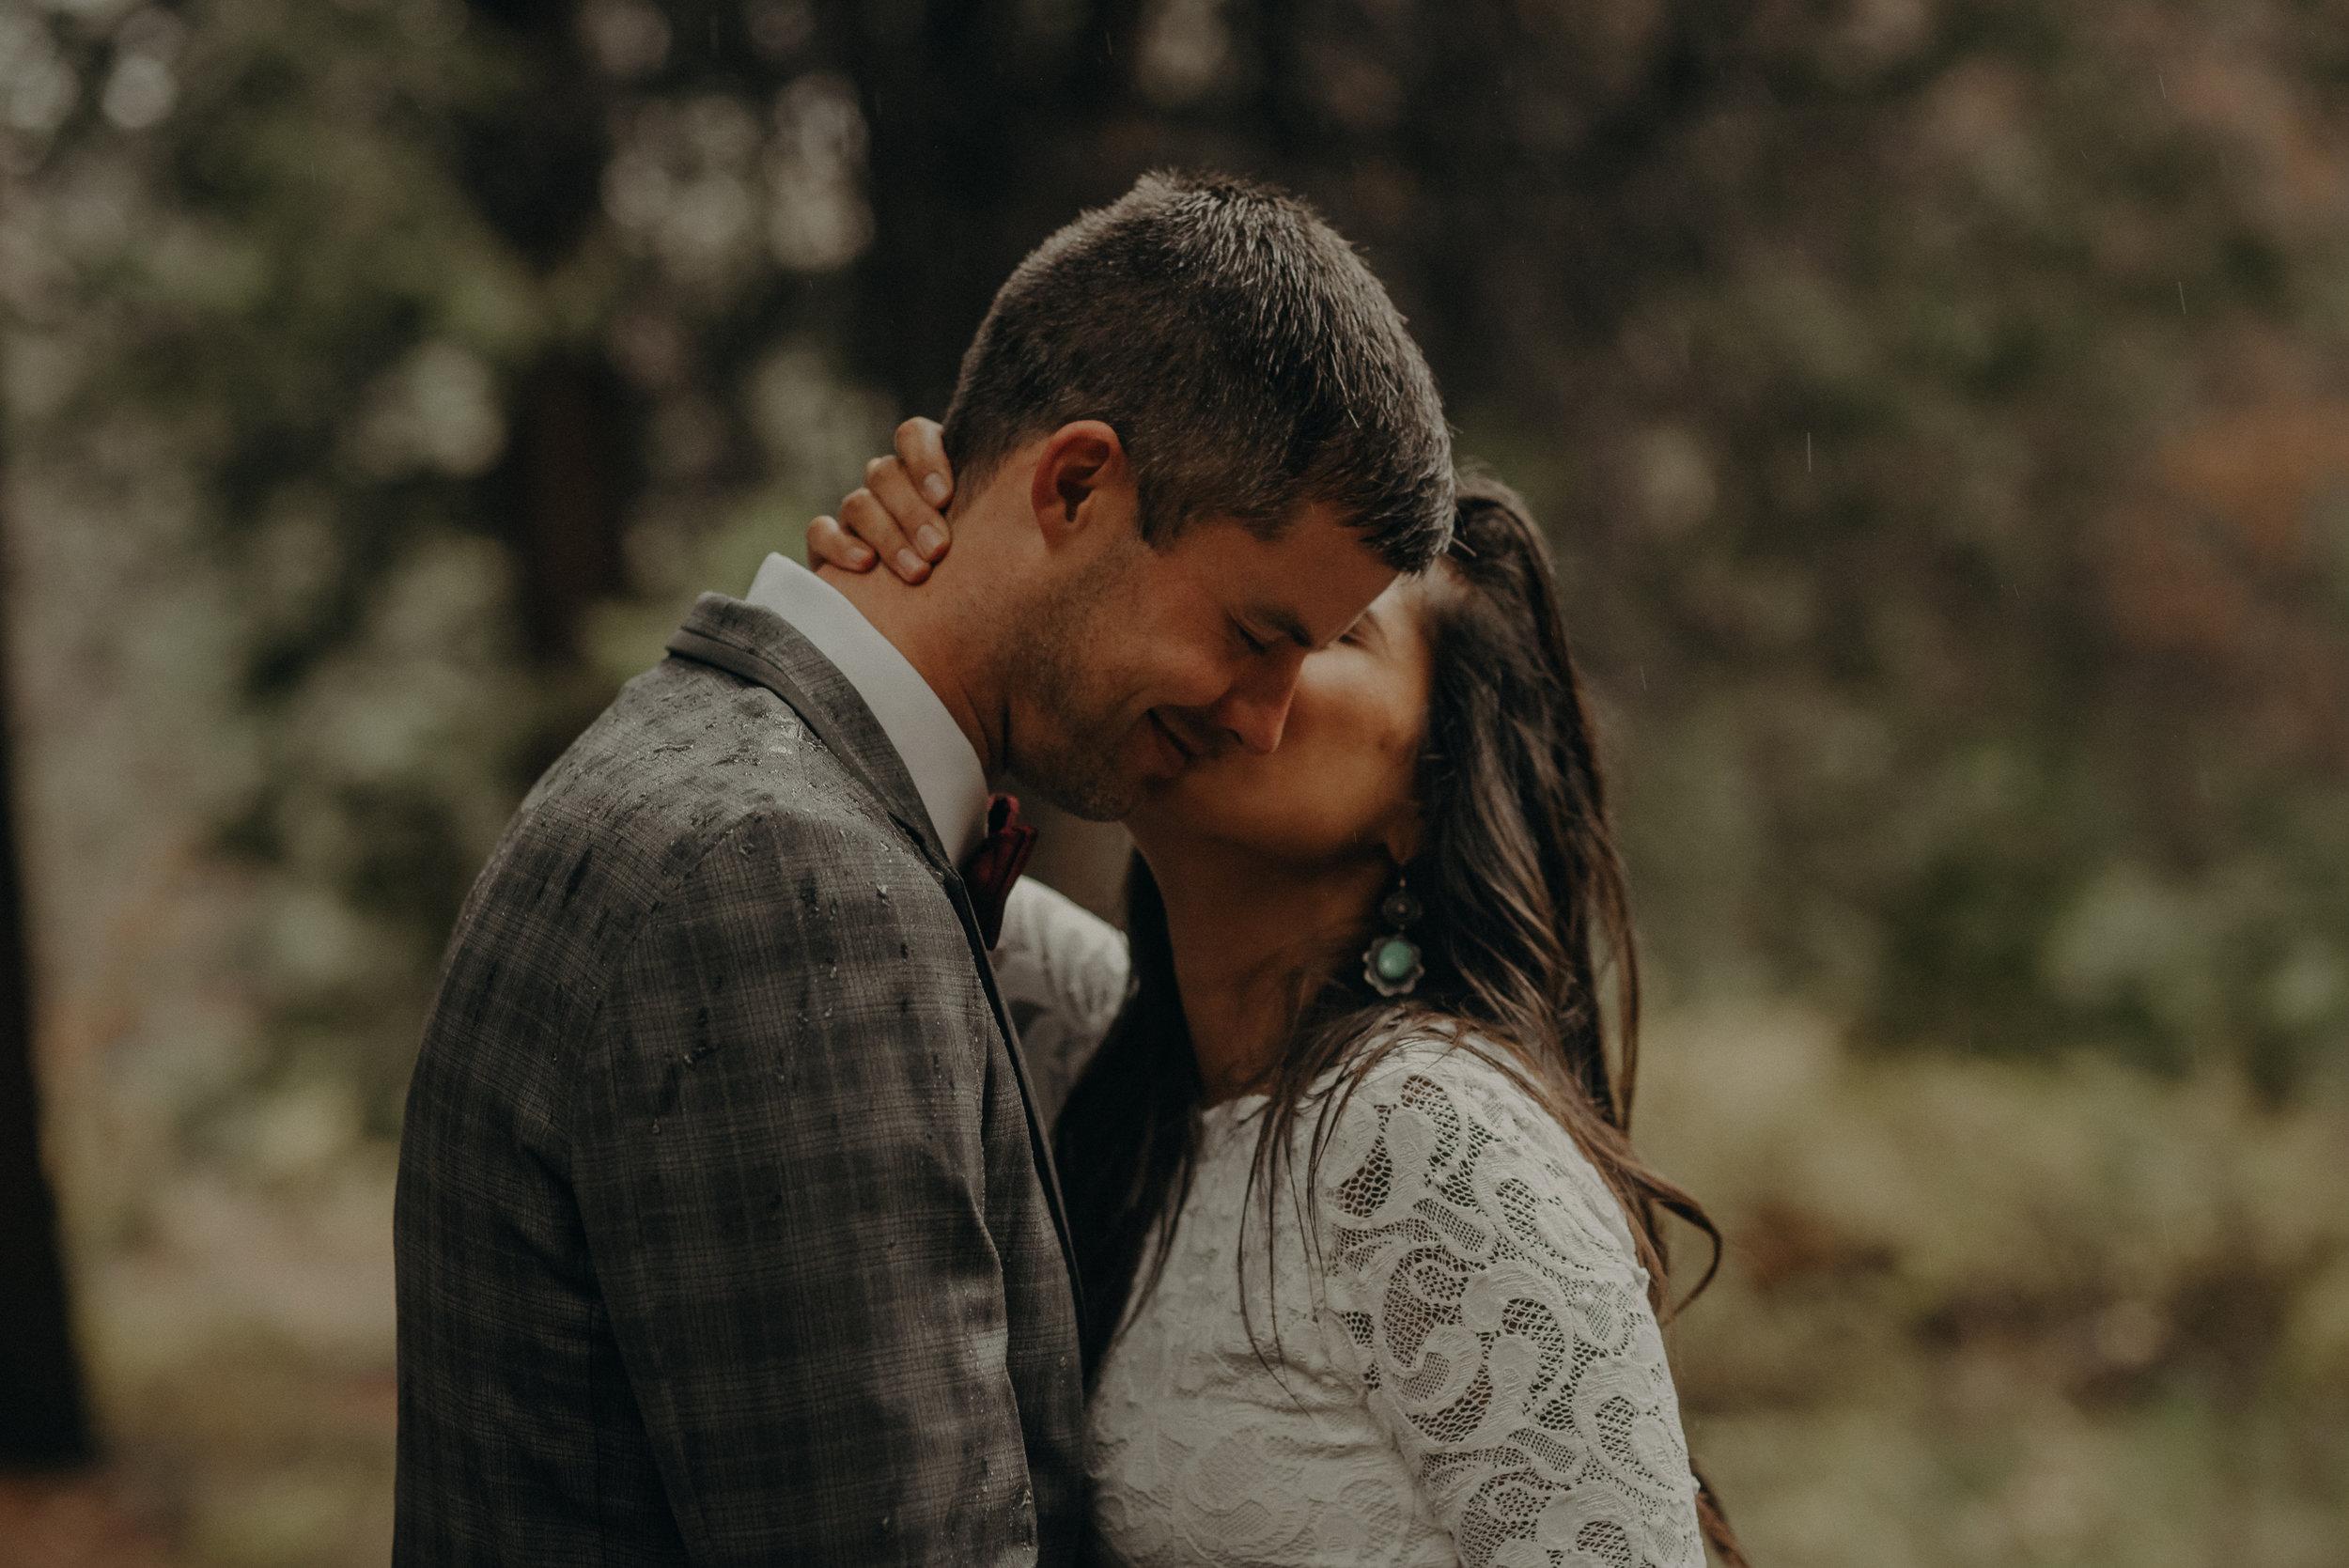 Isaiah + Taylor Photography - Yosemite Elopement - Los Angeles Wedding Photographer-17.jpg